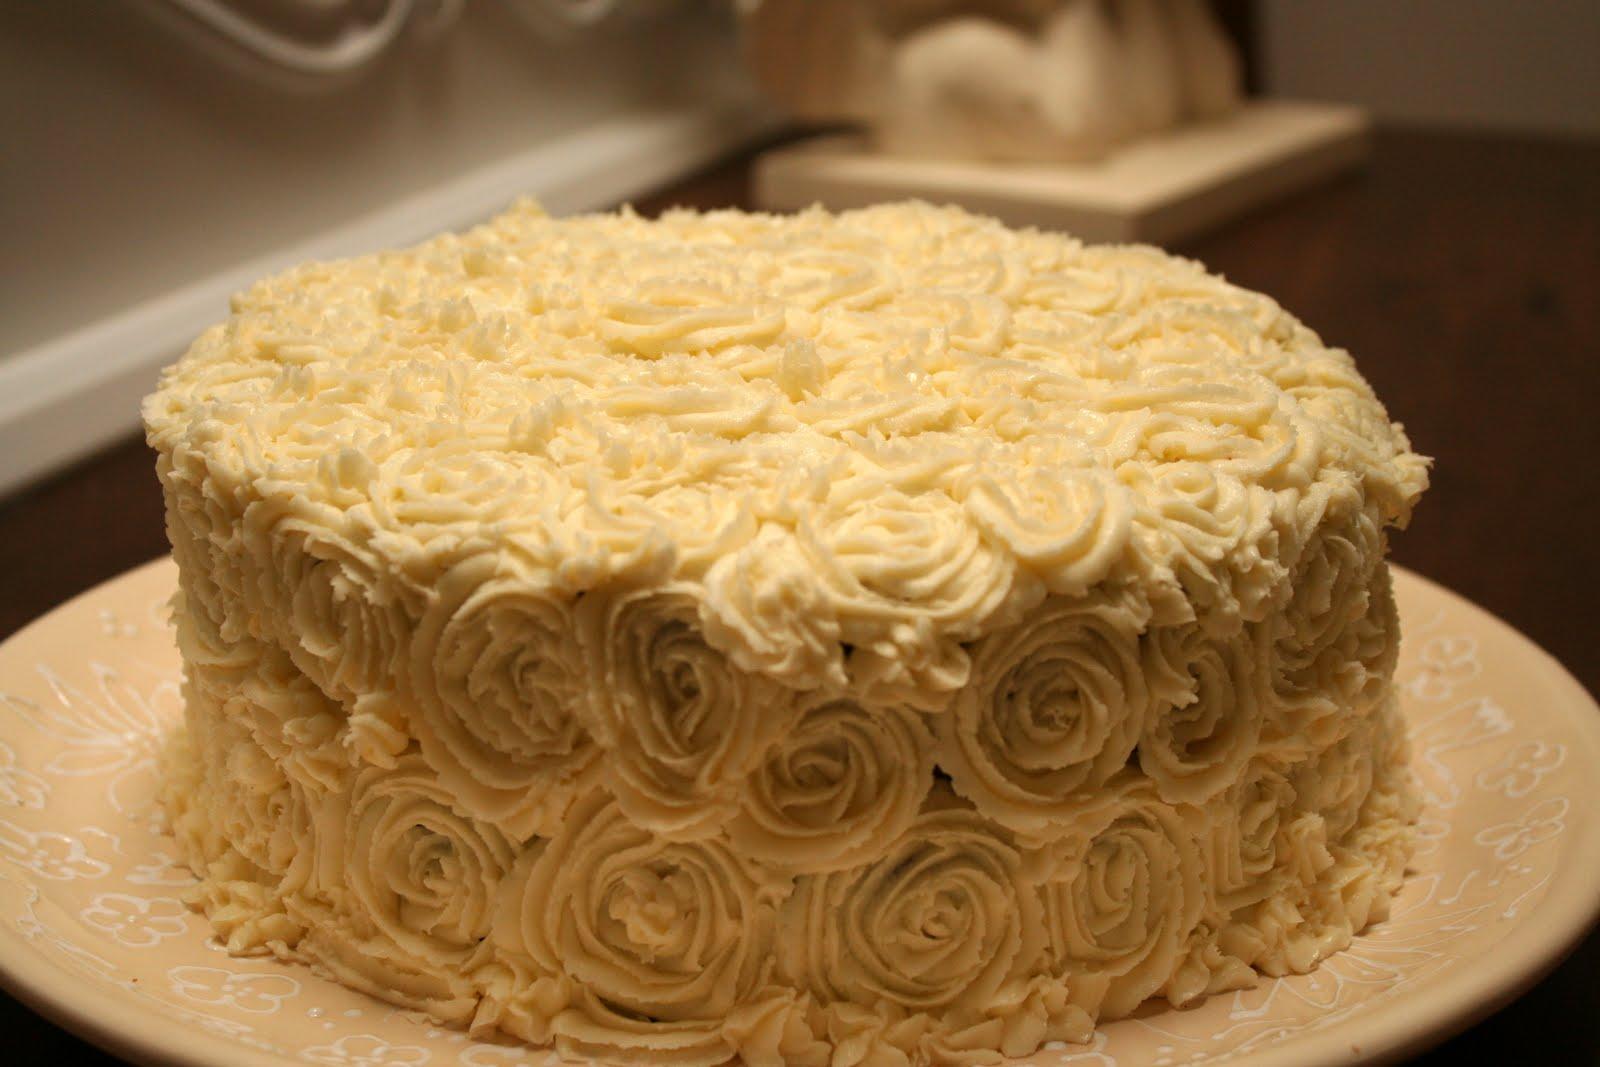 Recipes to make a birthday cake